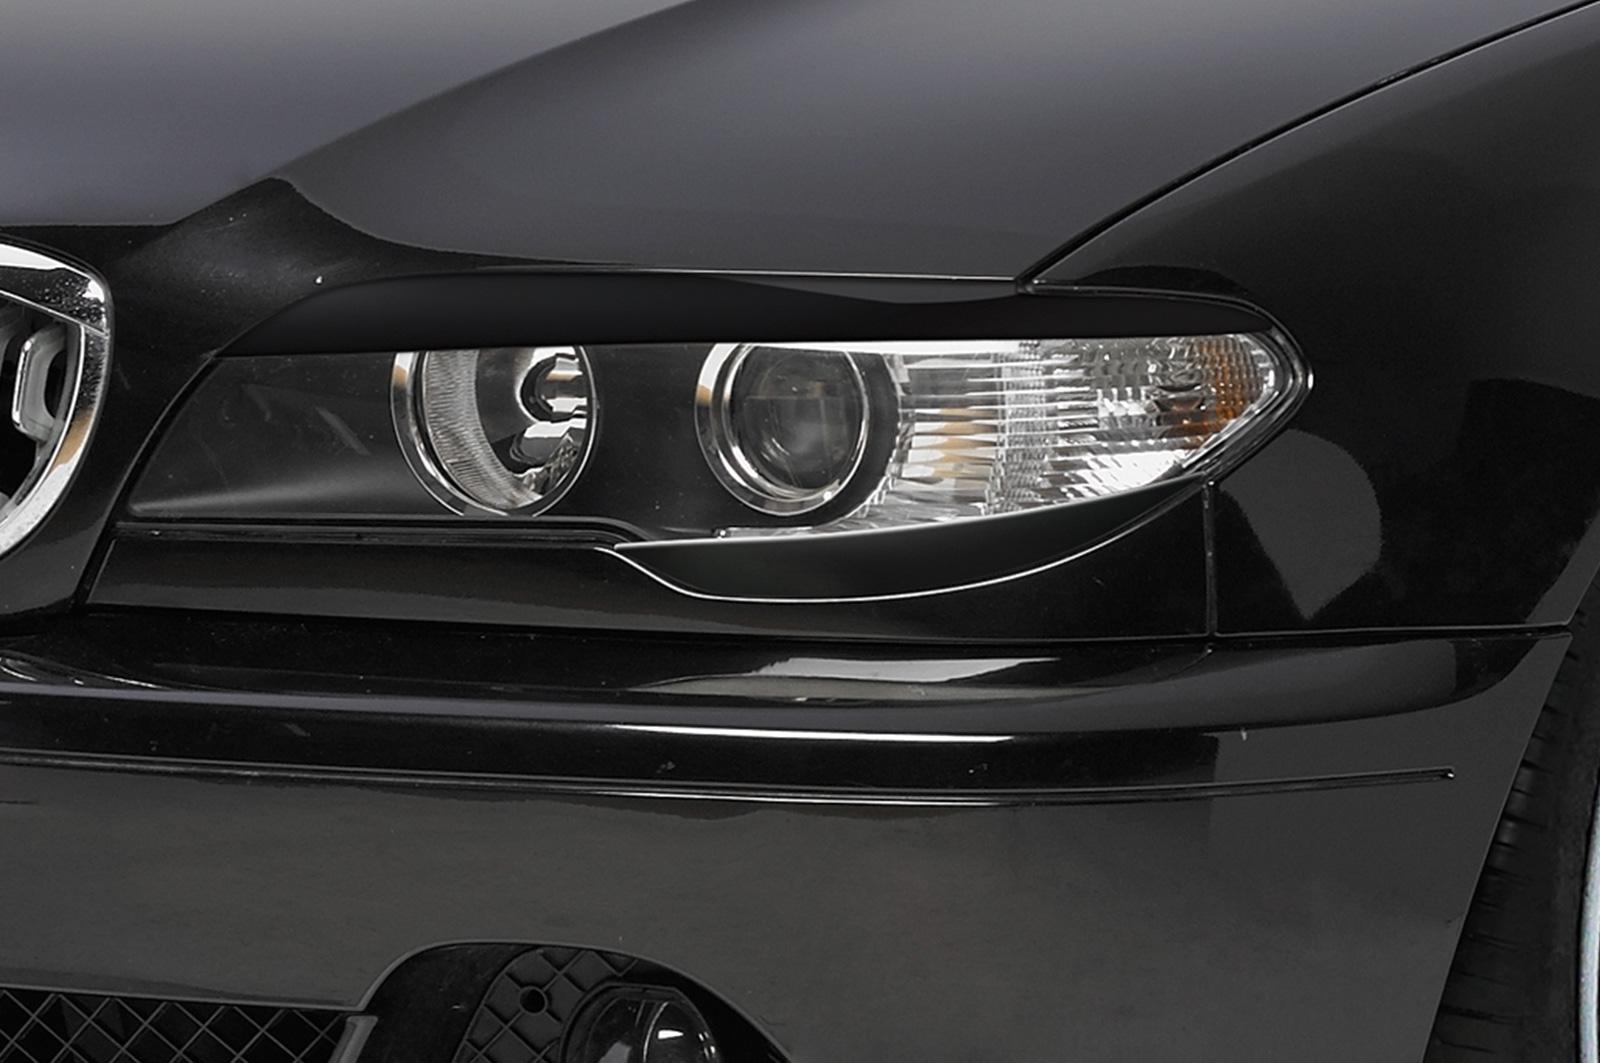 RDX Scheinwerferblenden BMW E39 Böser Blick Blenden Spoiler Tuning